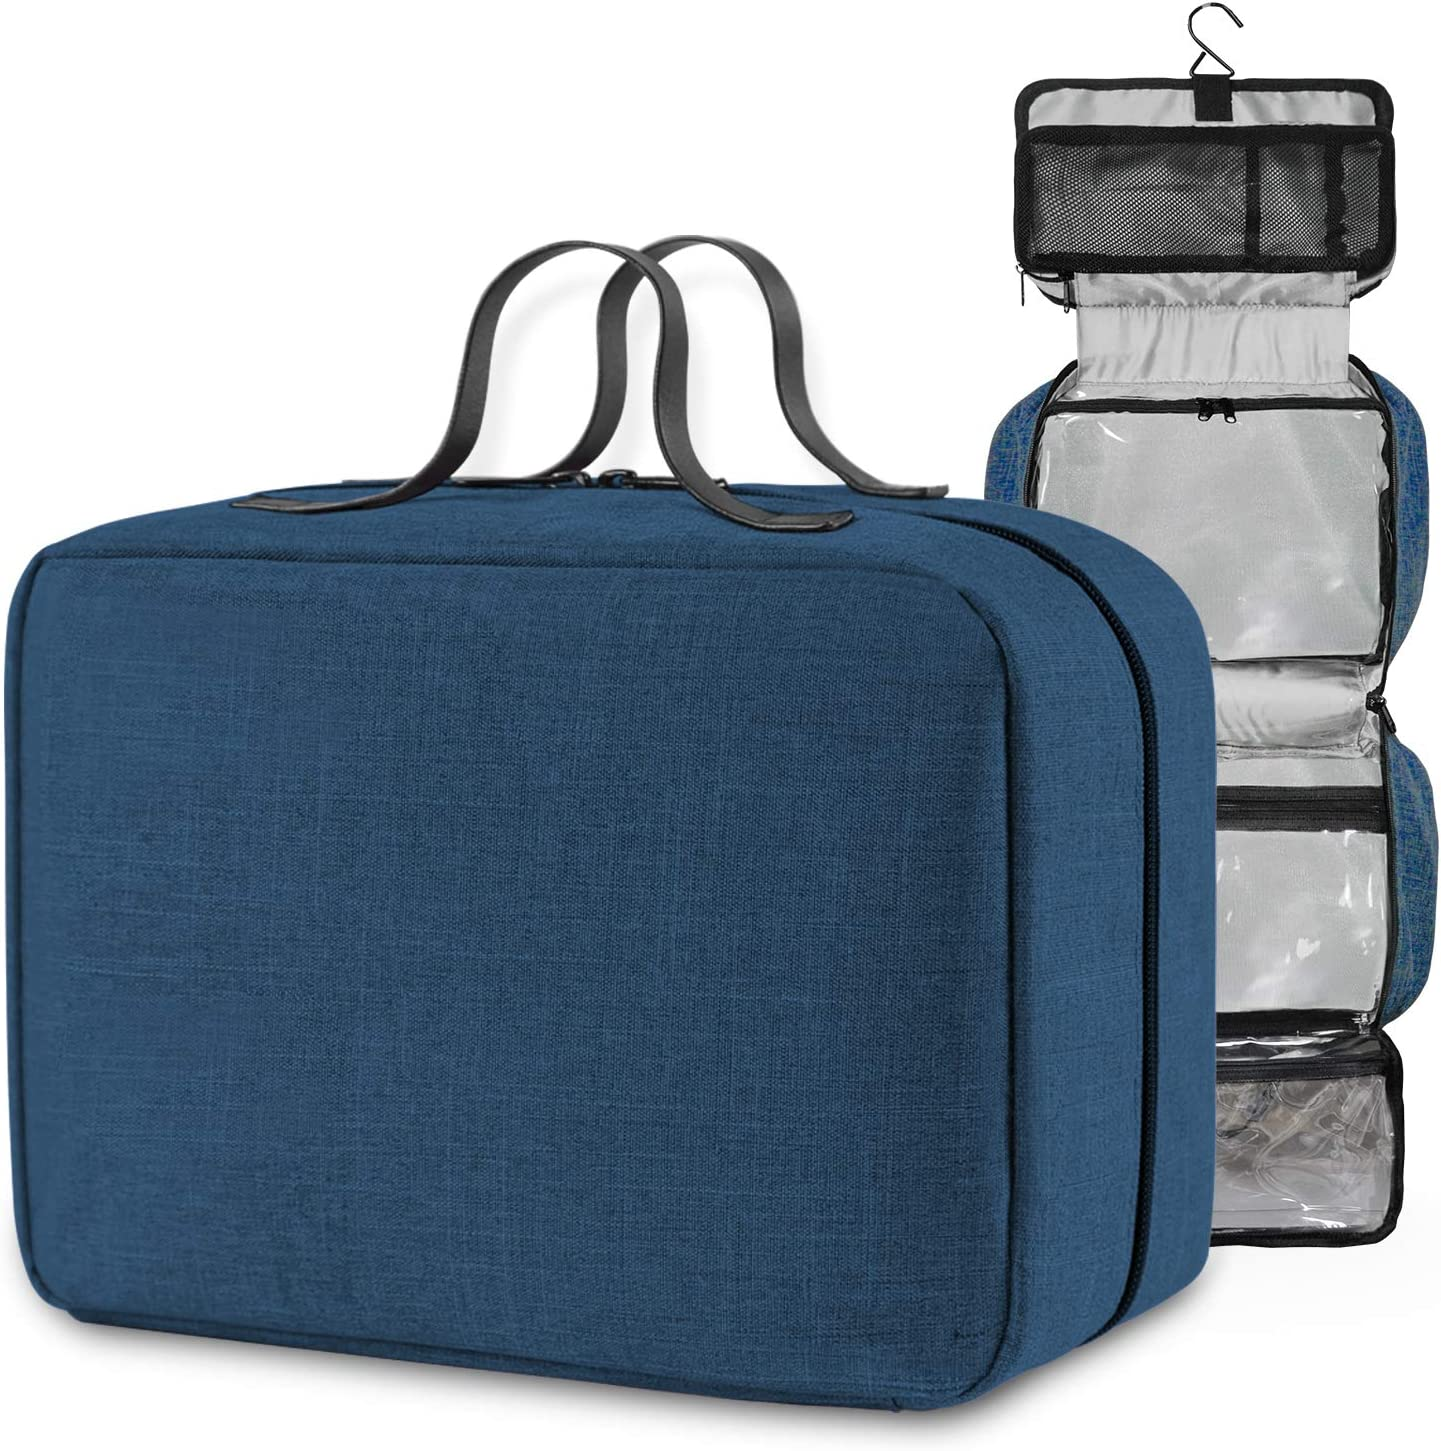 Tan Rawlings Heart of The Hide Travel Kit